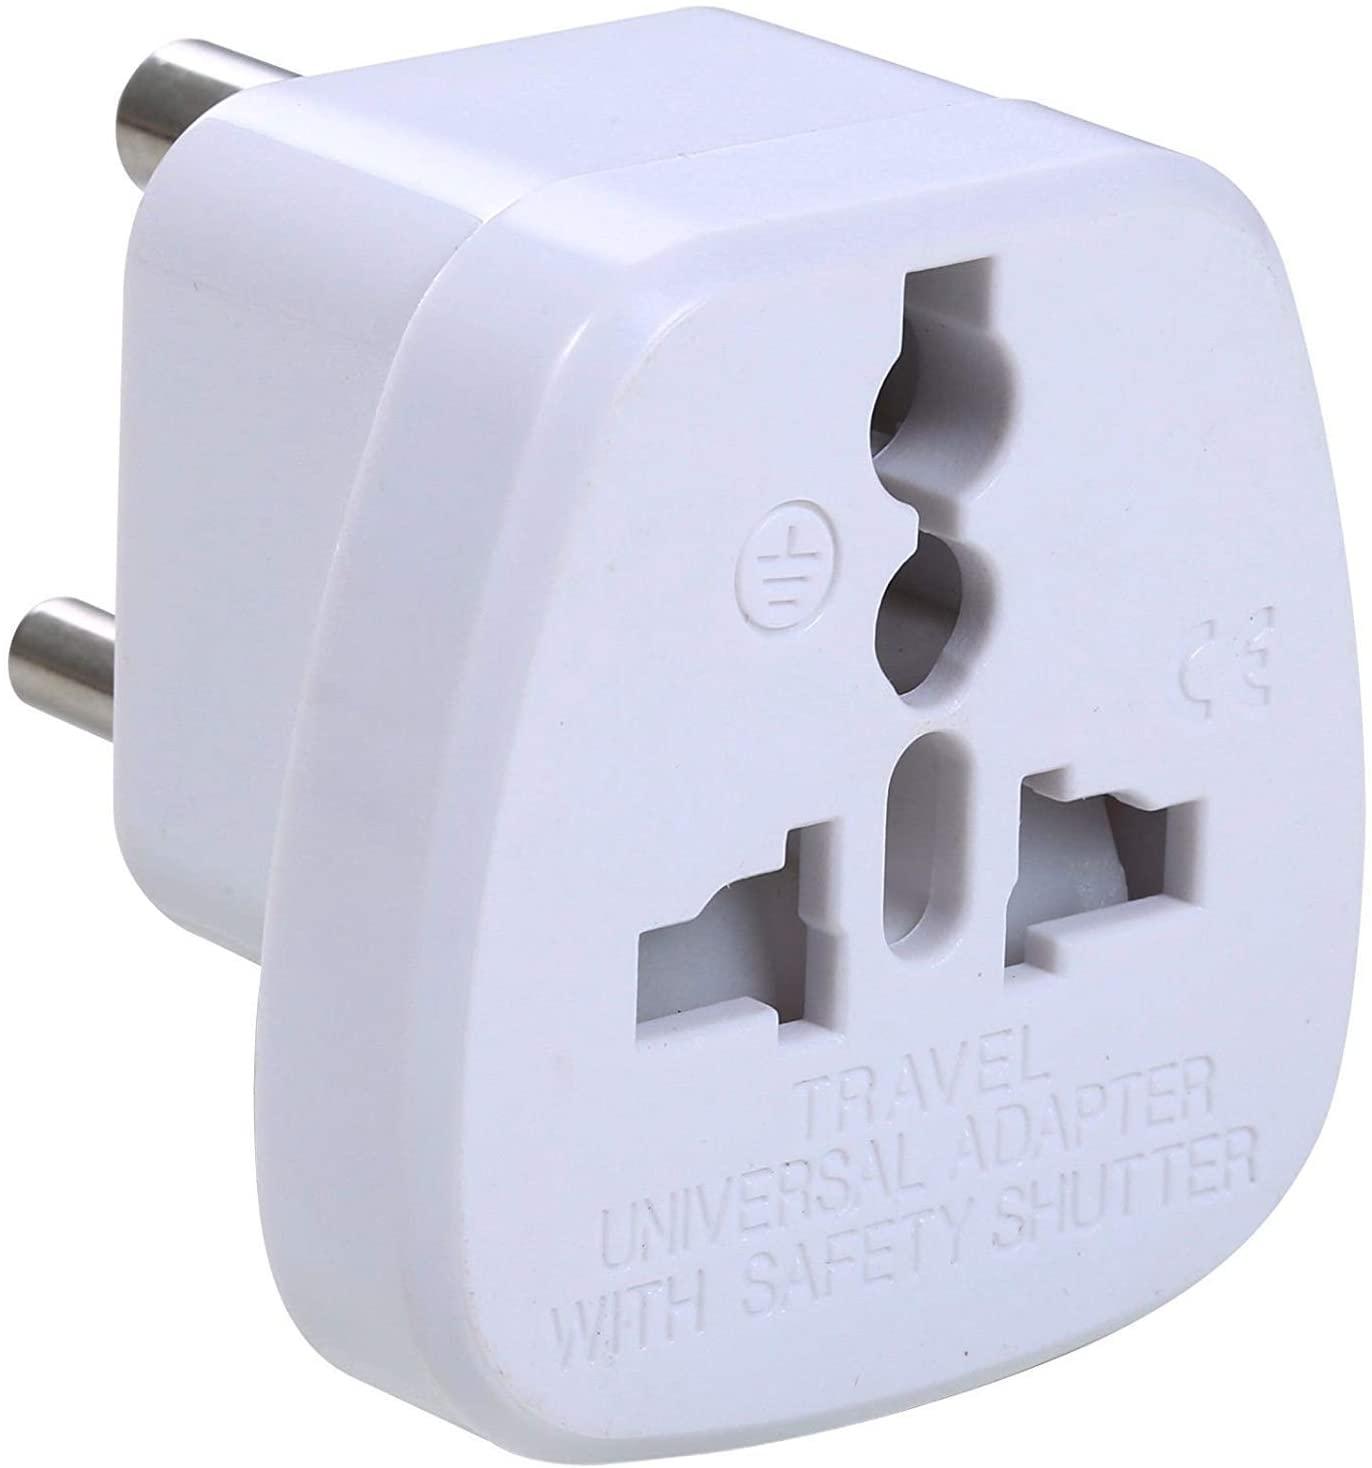 UHPPOTE Type D Travel Plug Adapter Adaptor for India Nepal Pakistan Nepal Bhutan (Pack of 5)